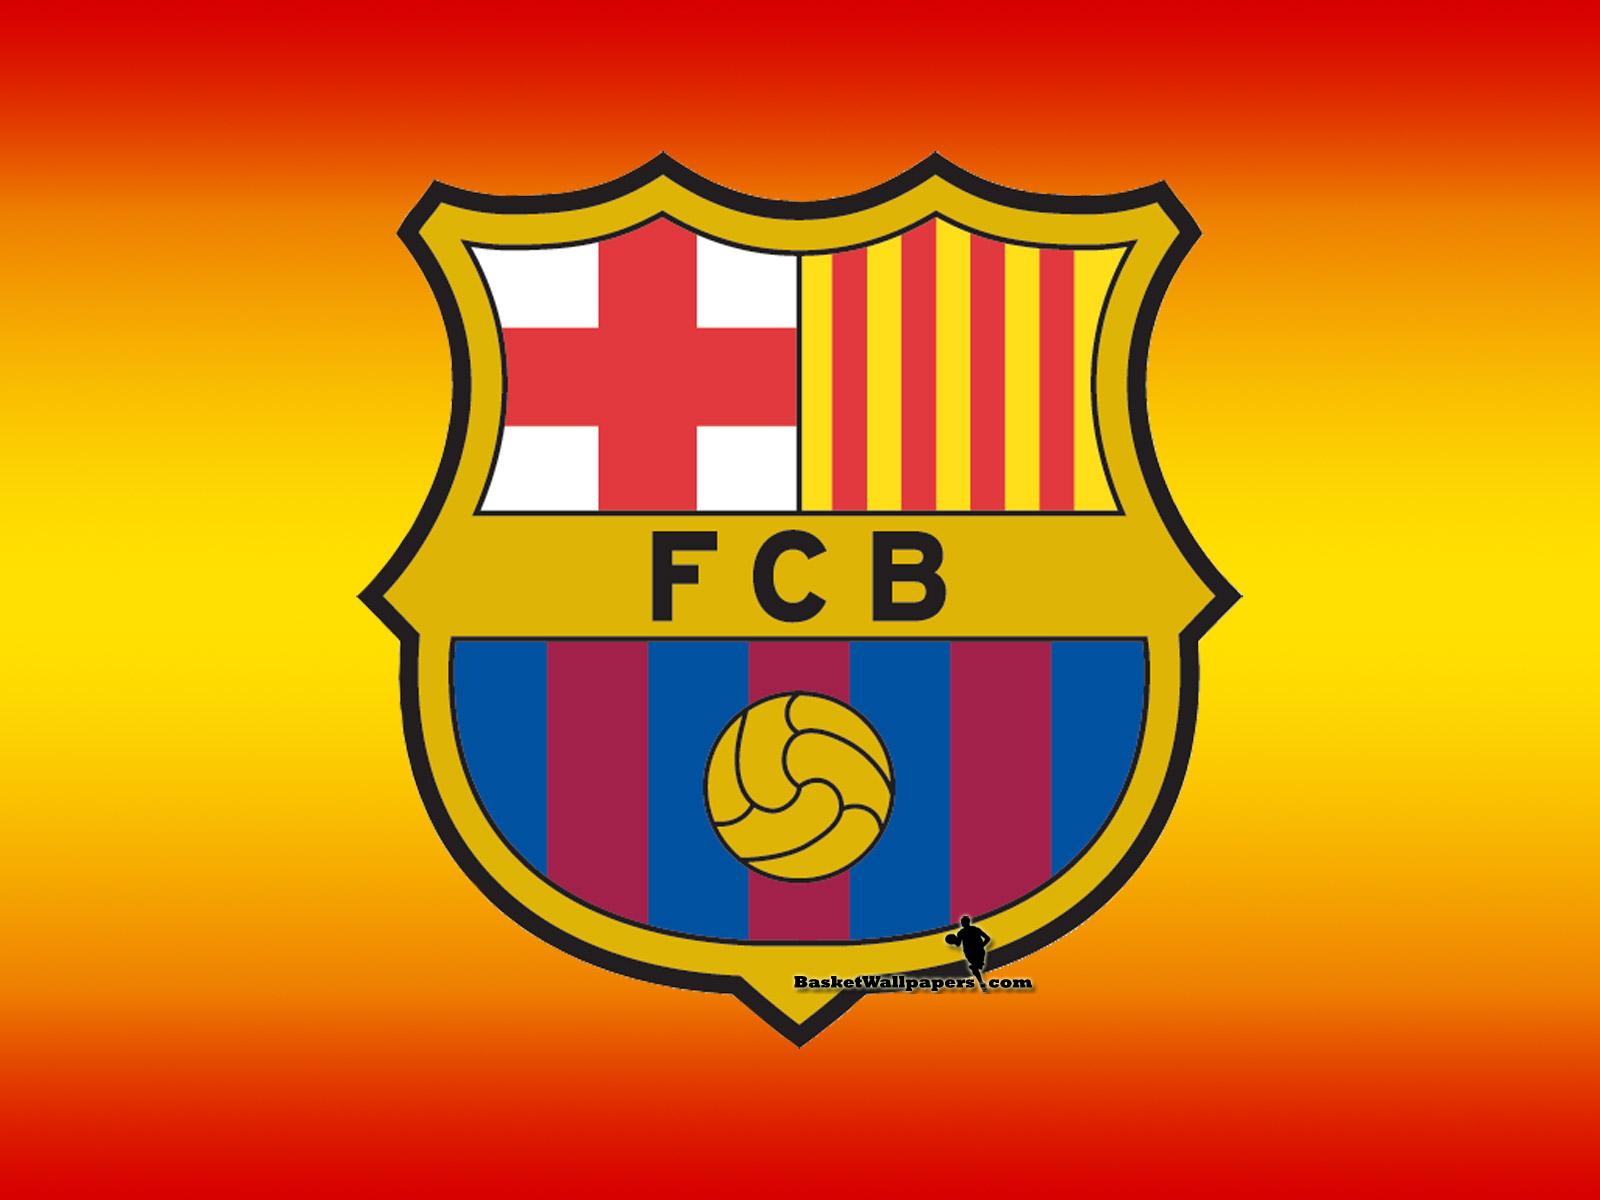 5 Alasan Kenapa Barcelona bakal Sulit untuk Menjuarai La Liga 2017-2018